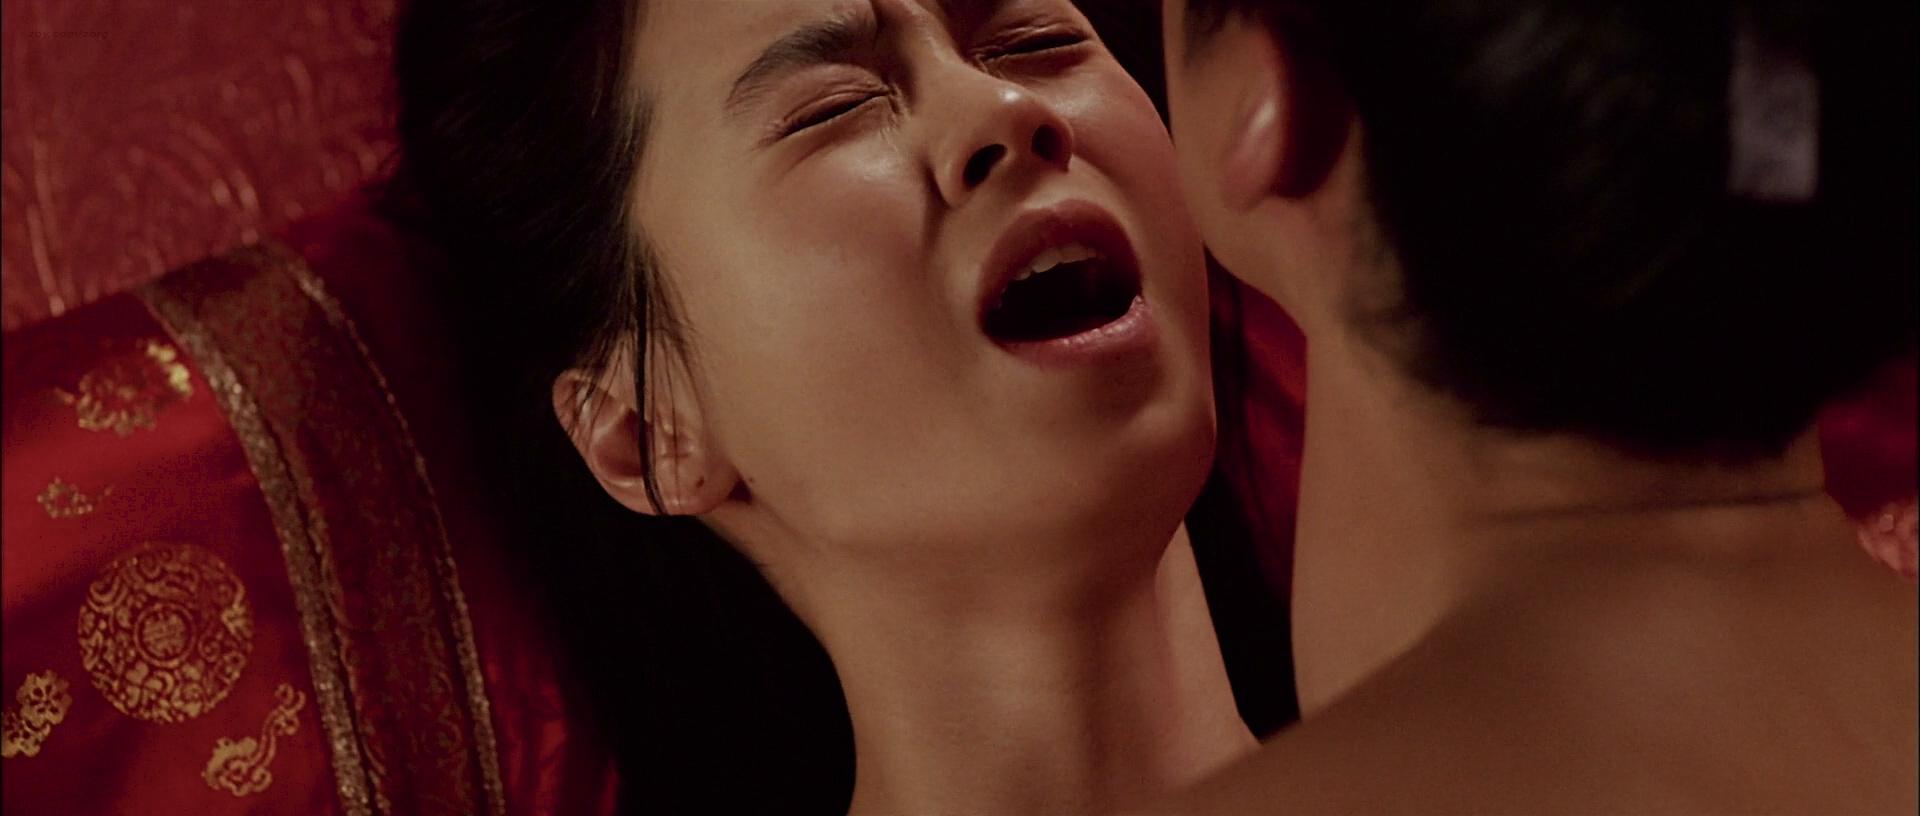 Ji-hyo Song nude topless butt and lot of hot sex - A Frozen Flower (KR-2008) HD 1080p BluRay (10)